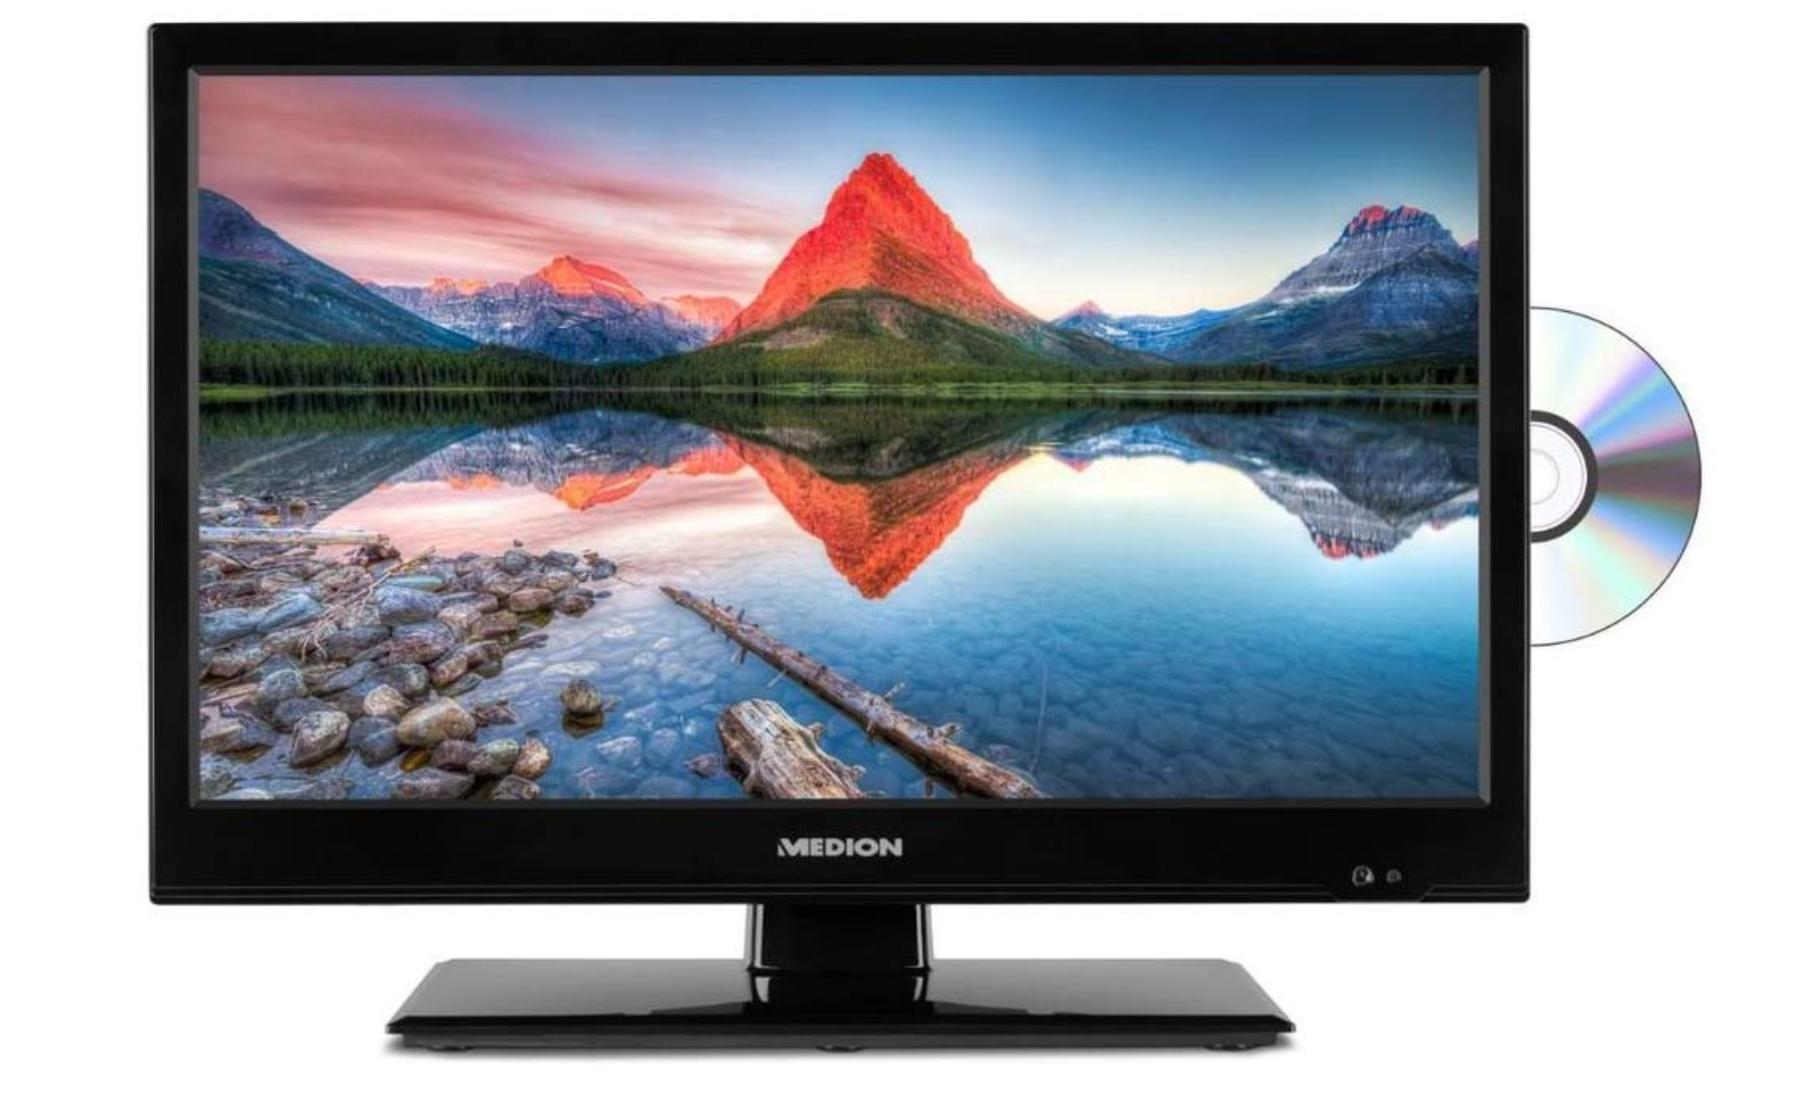 [Amazon] Medion P12309 Camping / Caravan TV 47 cm (18,5 Zoll HD) Fernseher (Triple Tuner, DVB-T2) 12V